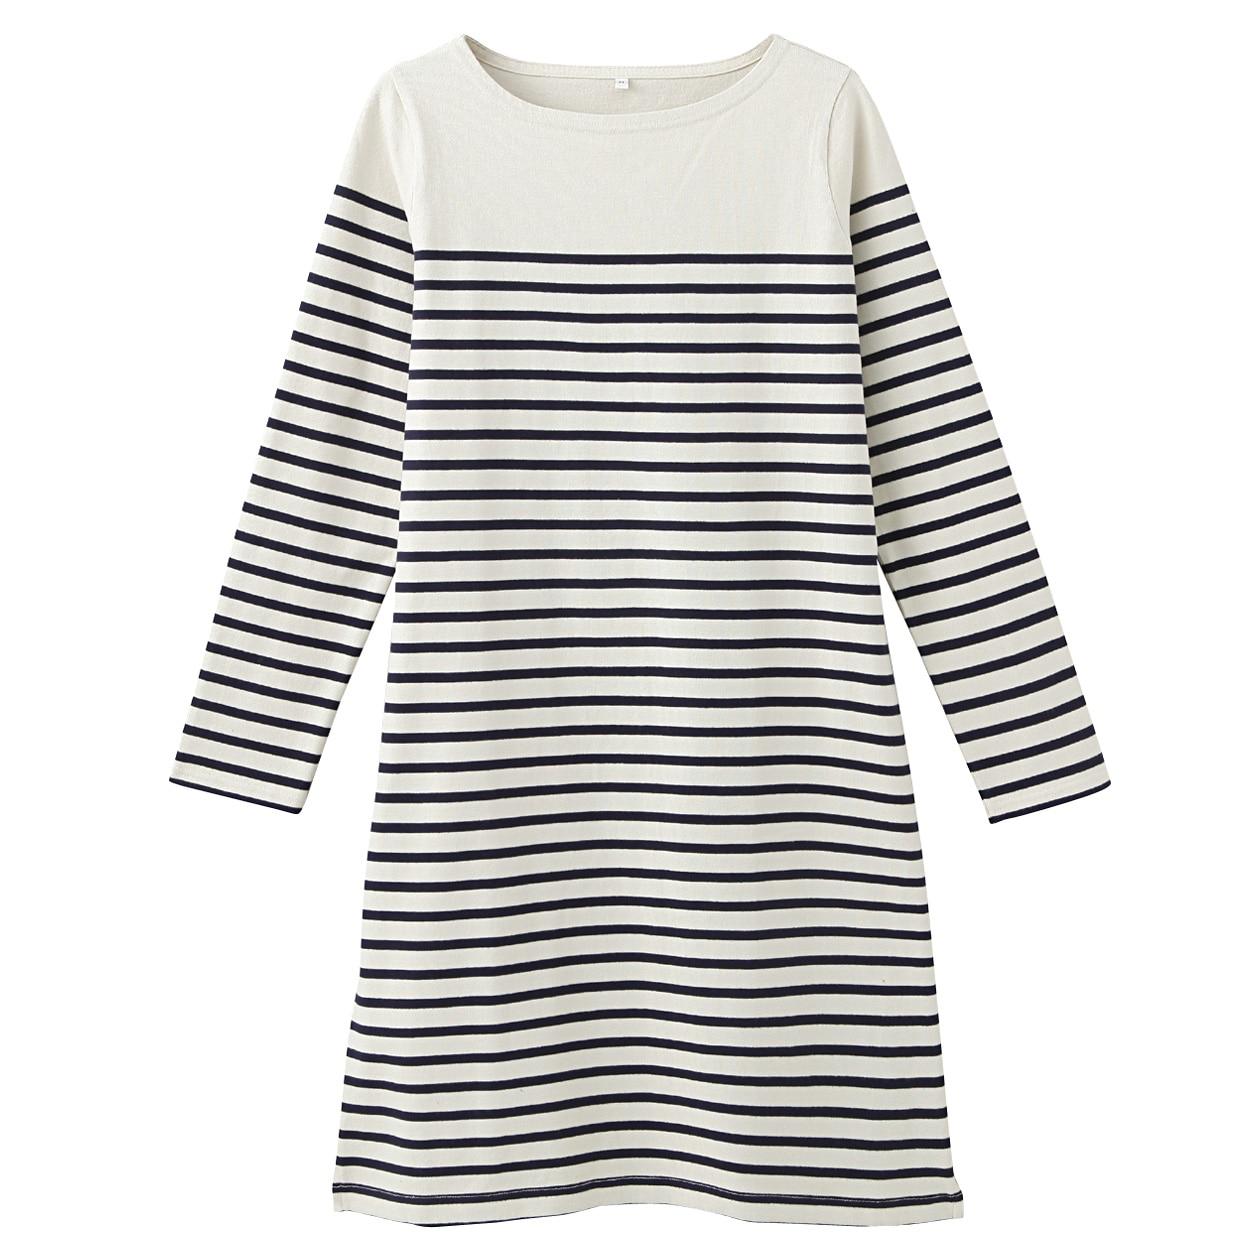 muji stripe striped organic cotton t shirt dress tunic. Black Bedroom Furniture Sets. Home Design Ideas